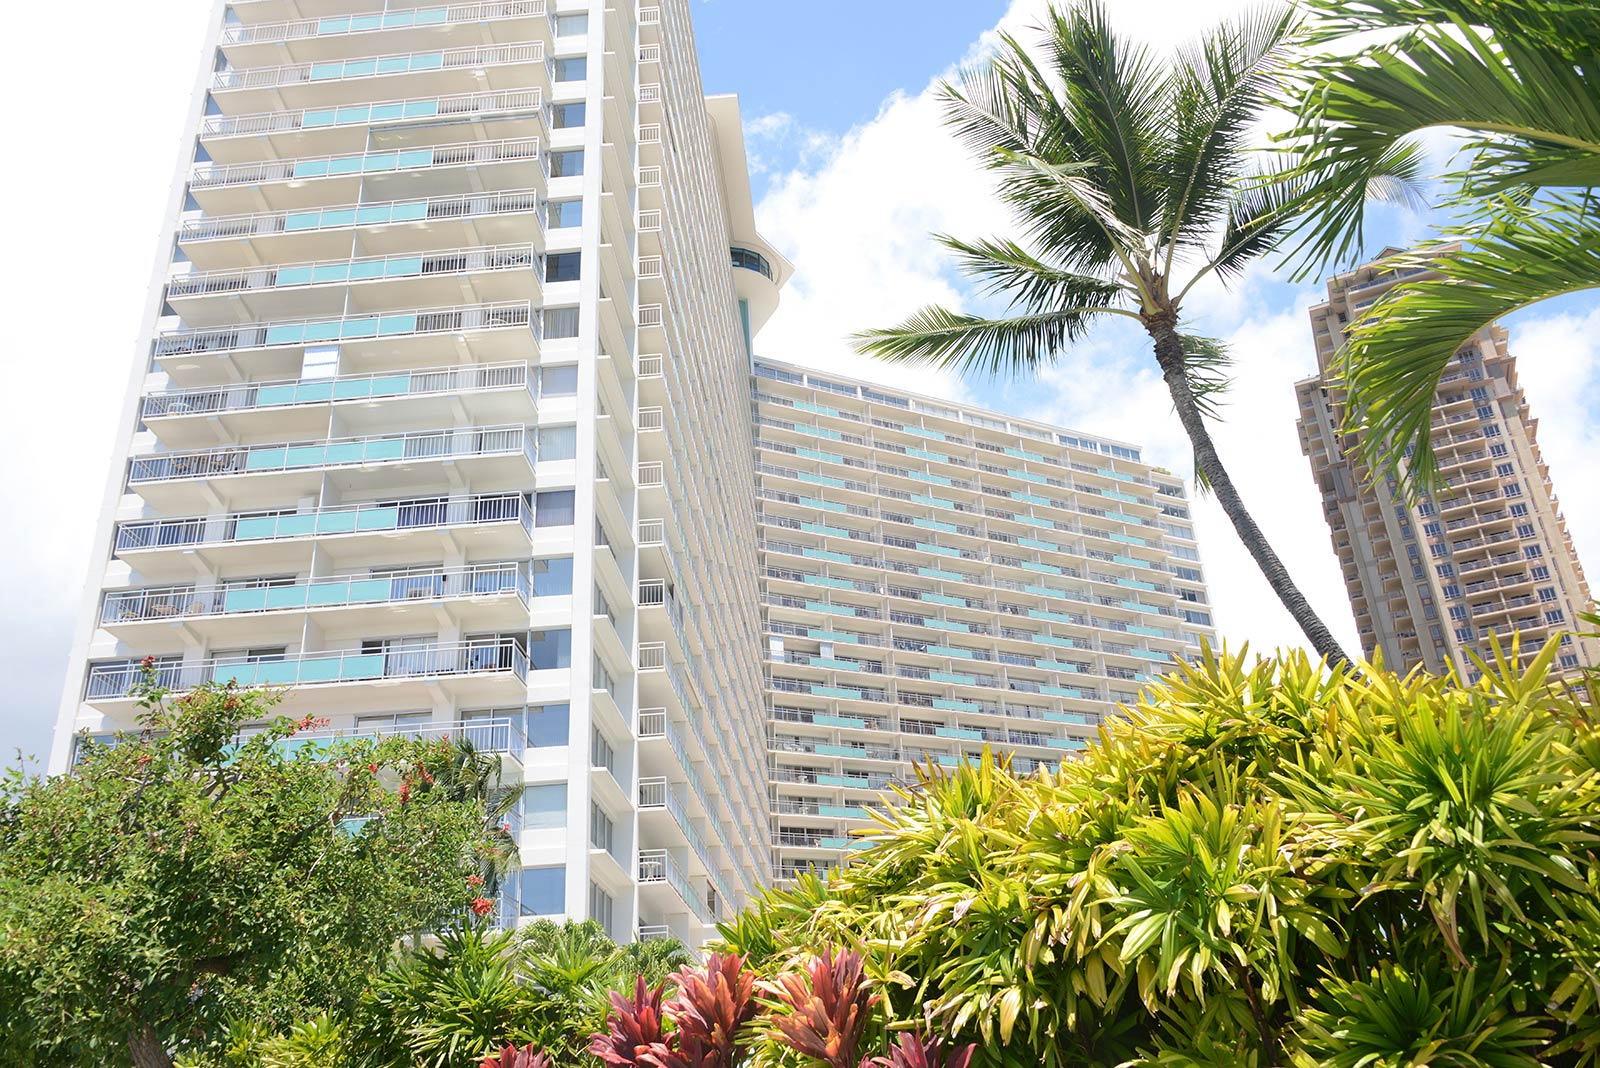 shell-vacations-hawaii-shell-owners-club-hawaii-2